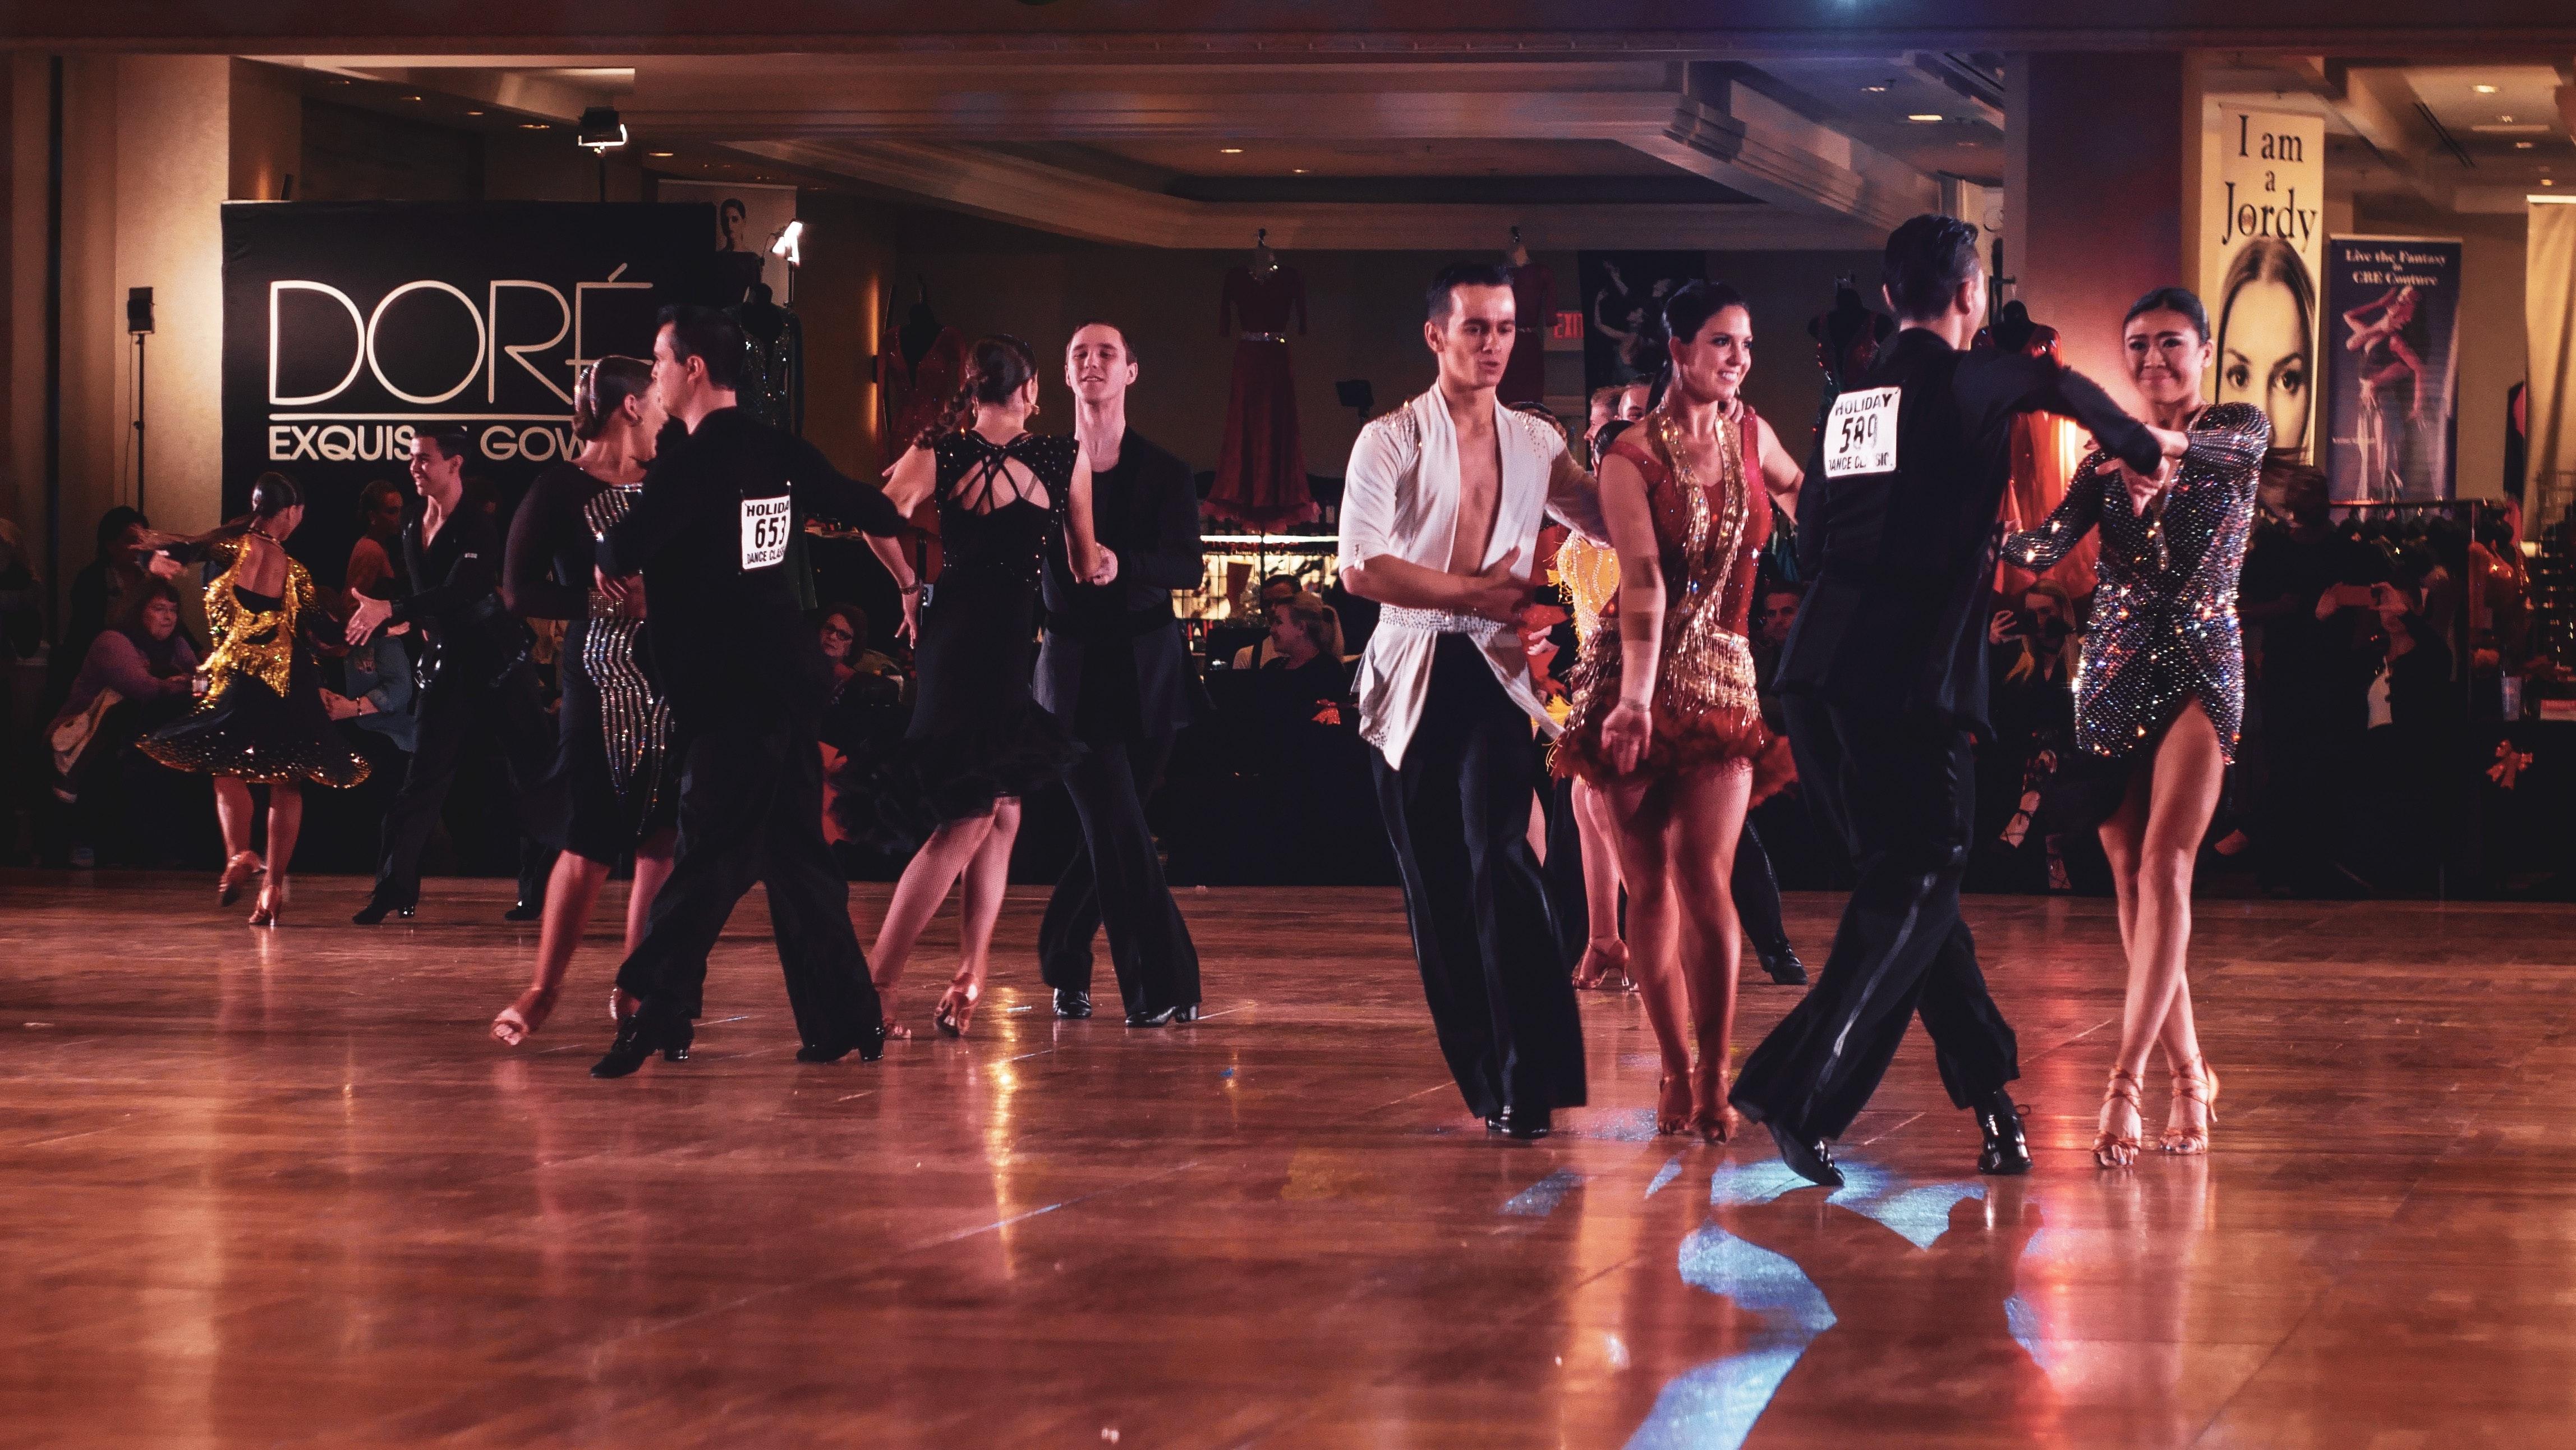 People Dancing On Dance Floor Free Stock Photo